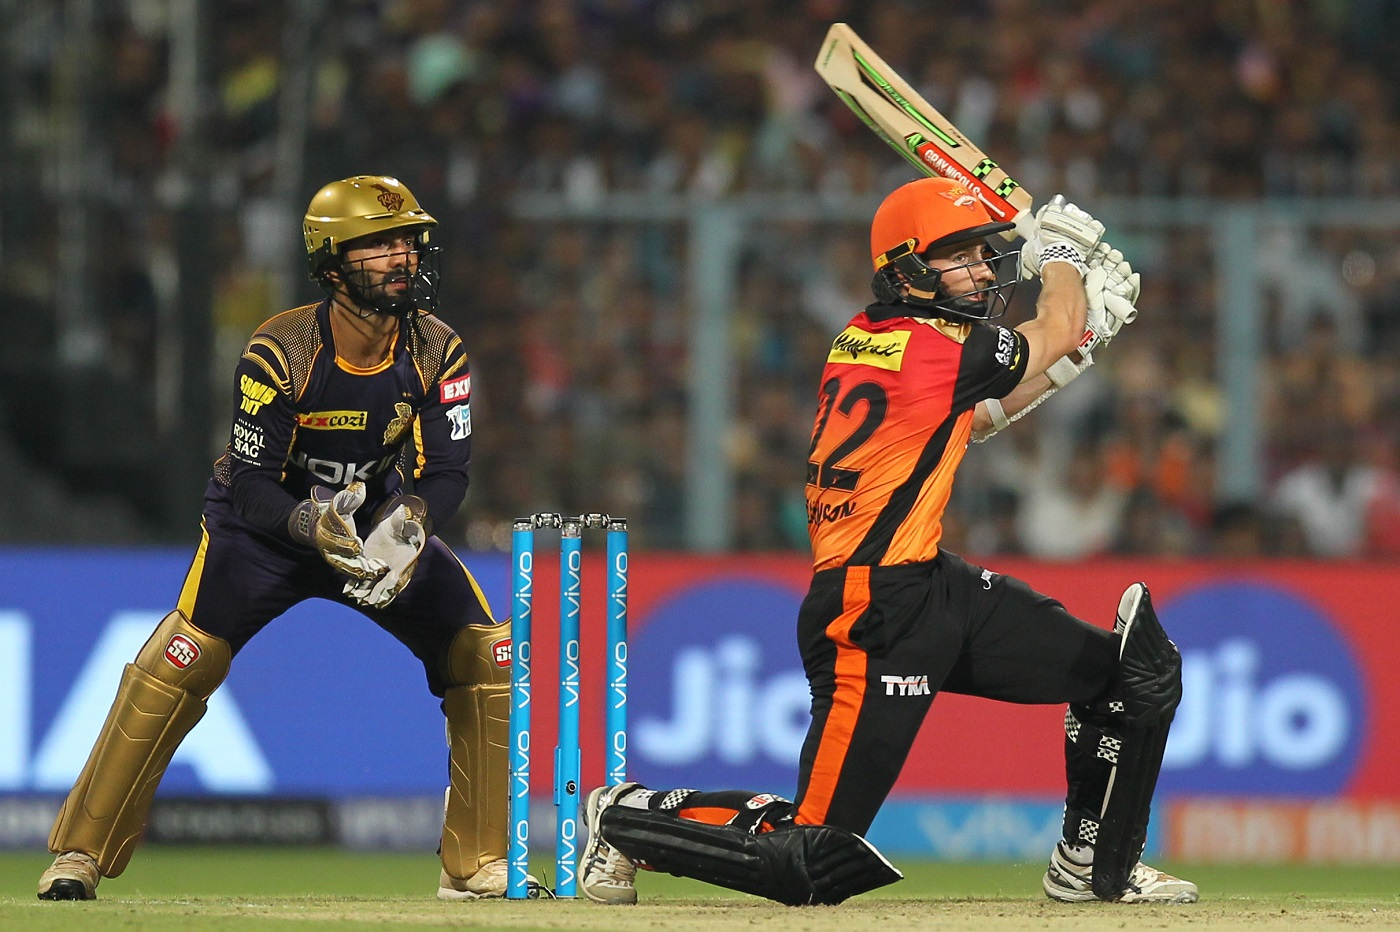 KKR vs SRH IPL 2018 MATCH No 10